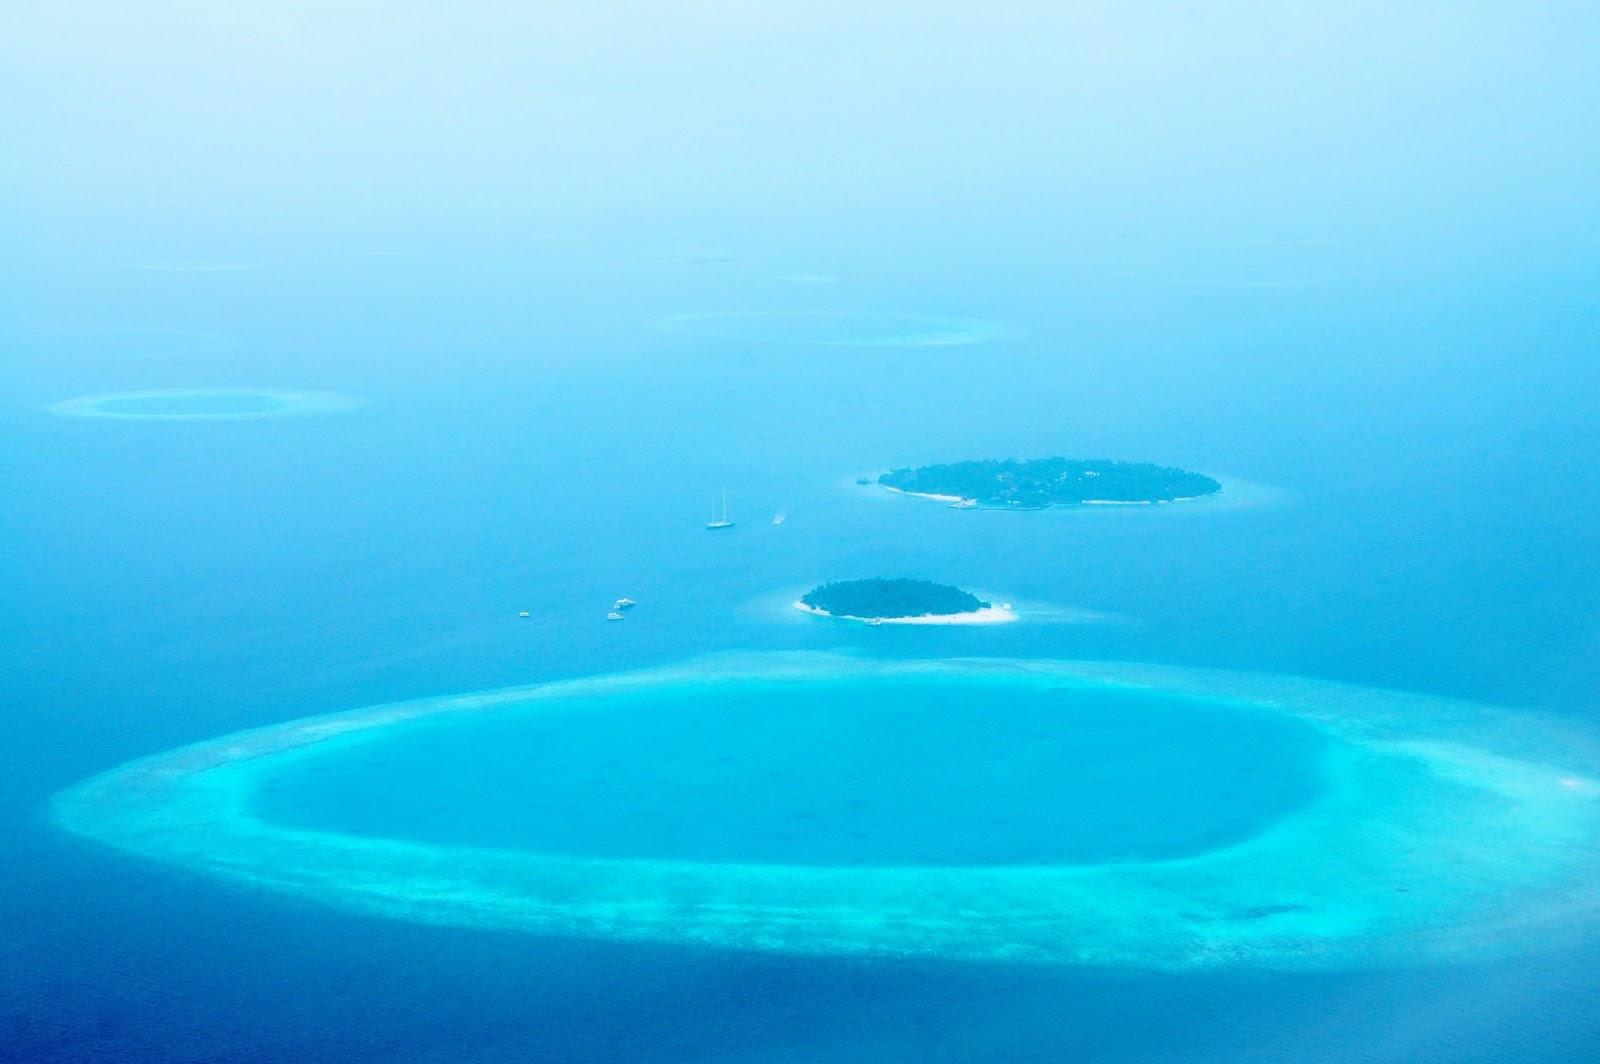 Maldives - Ultimate Travel Bucket List